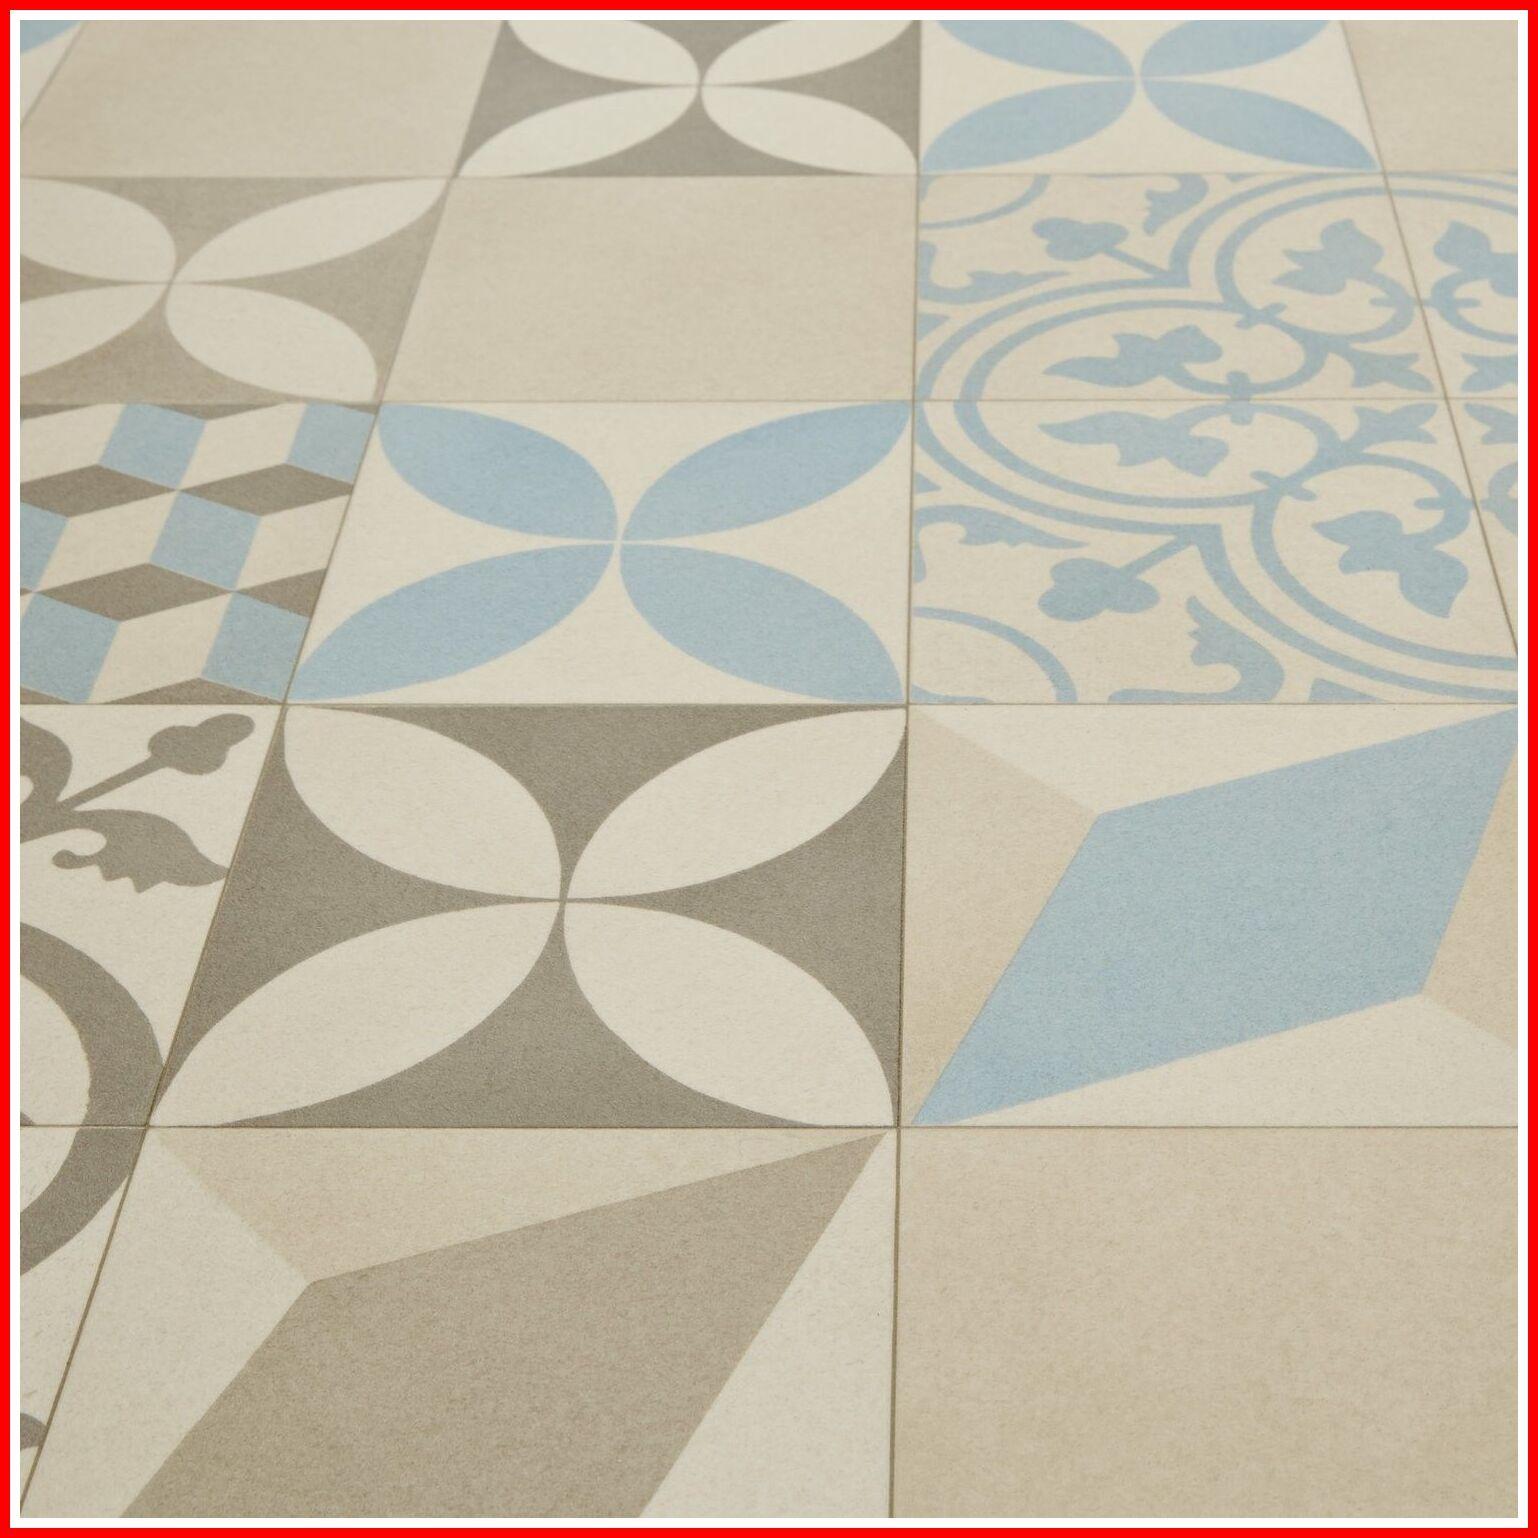 117 Reference Of Floor Tile Moroccan Laminate Flooring Ideas In 2020 Retro Vinyl Flooring Vinyl Flooring Vinyl Flooring Uk